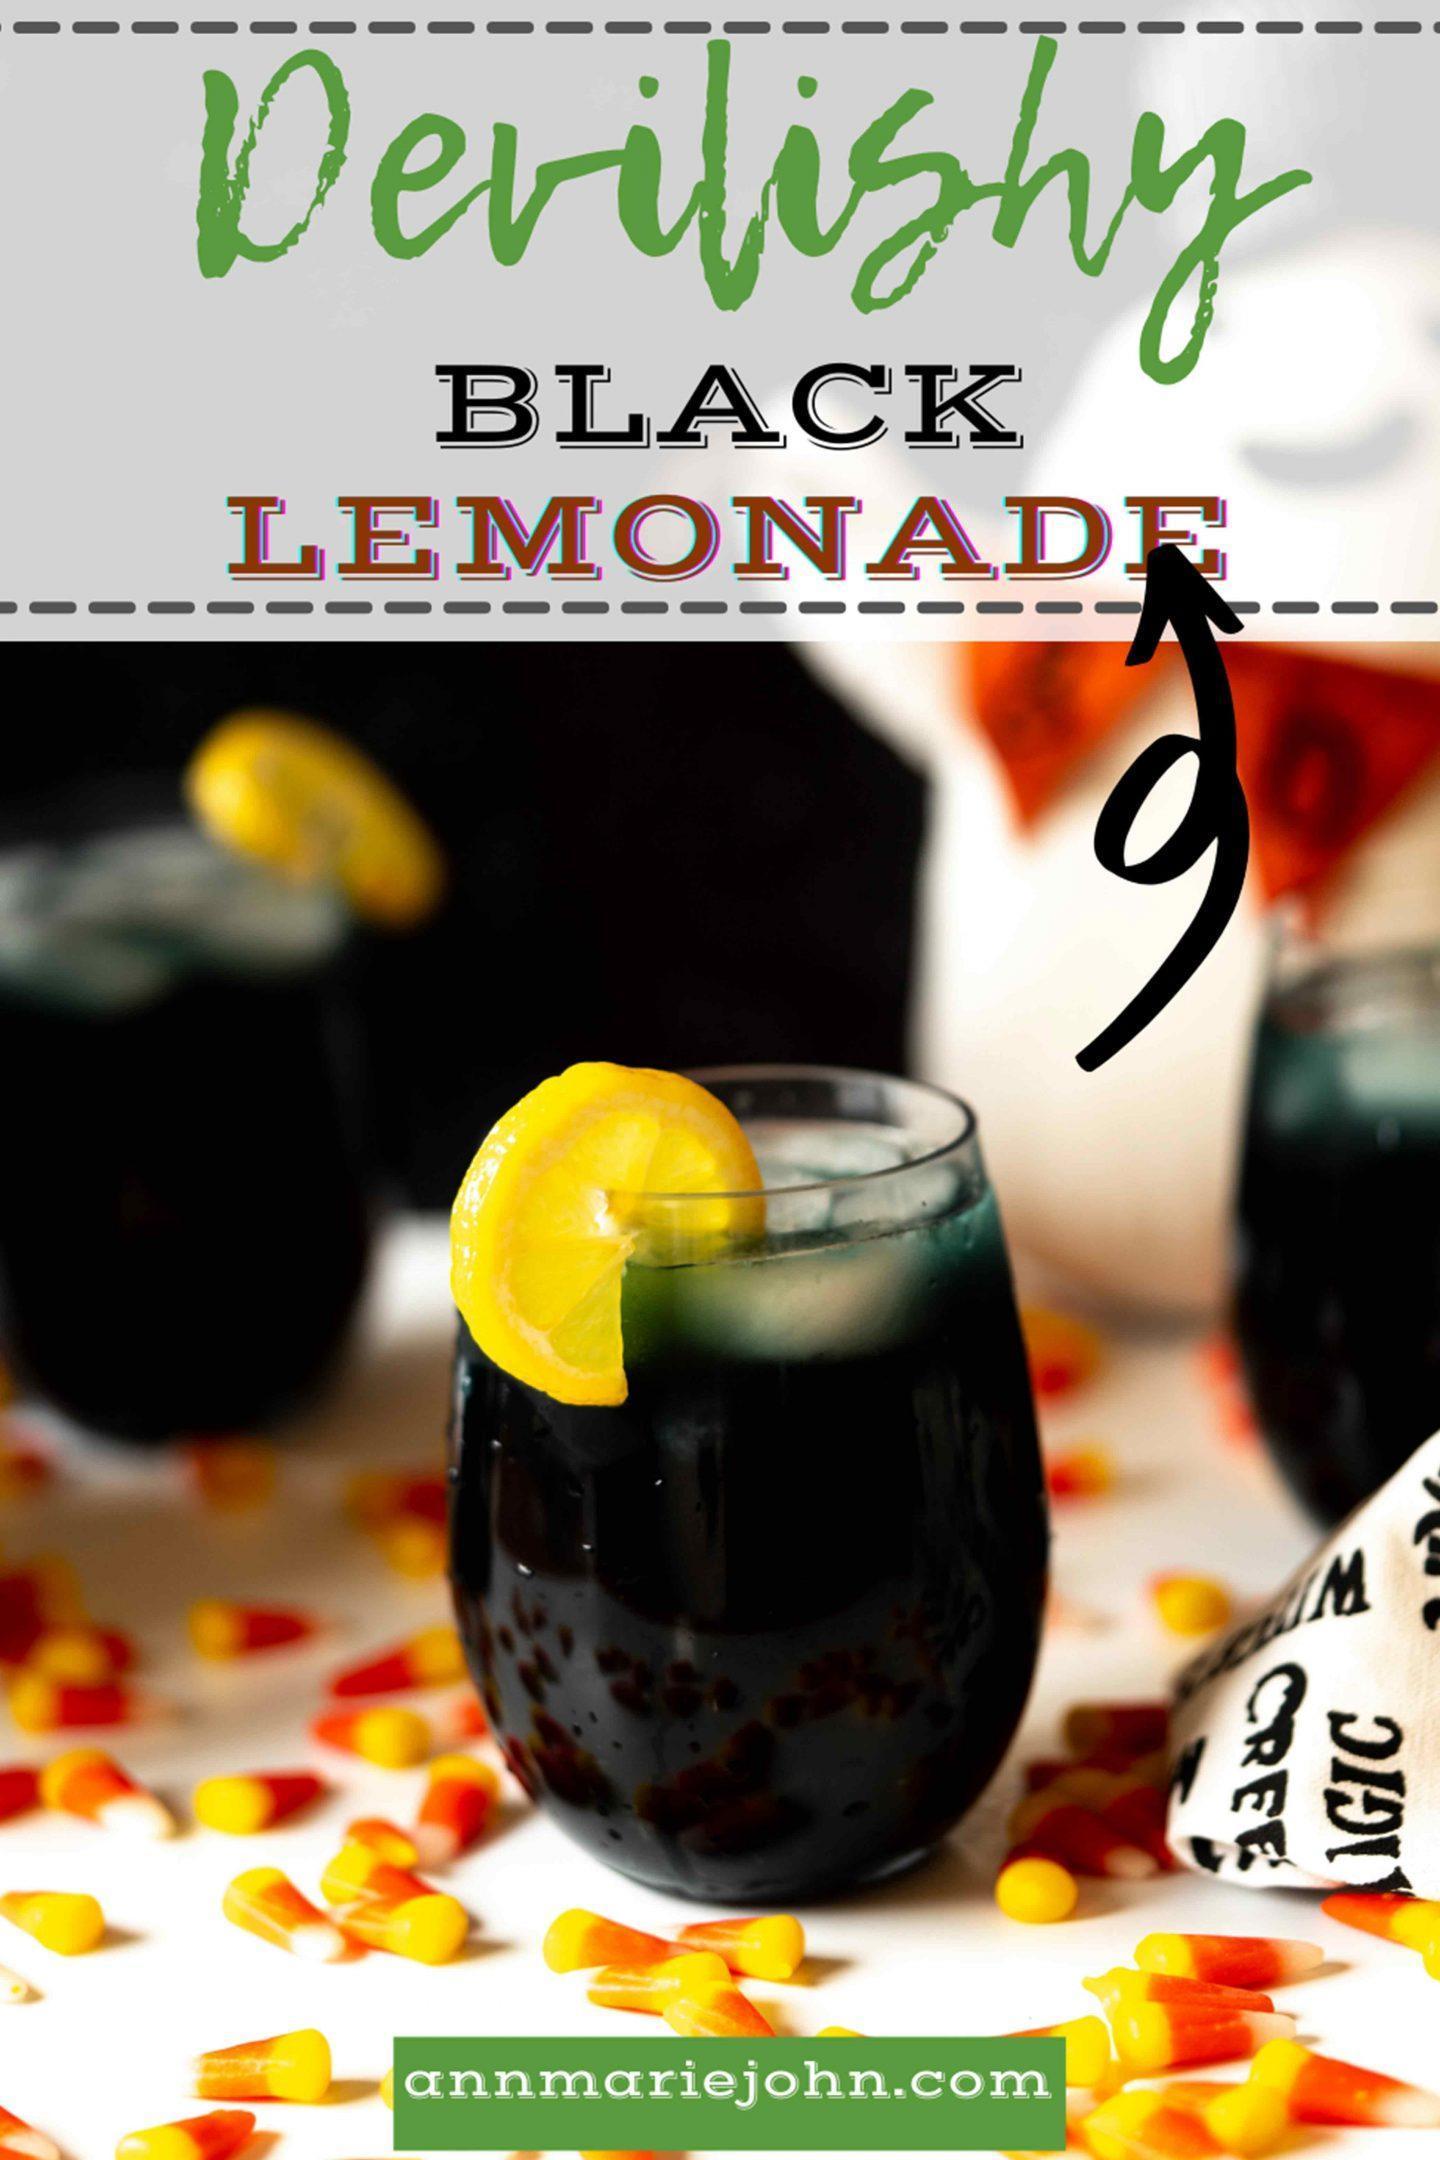 Devilishly Black Lemonade